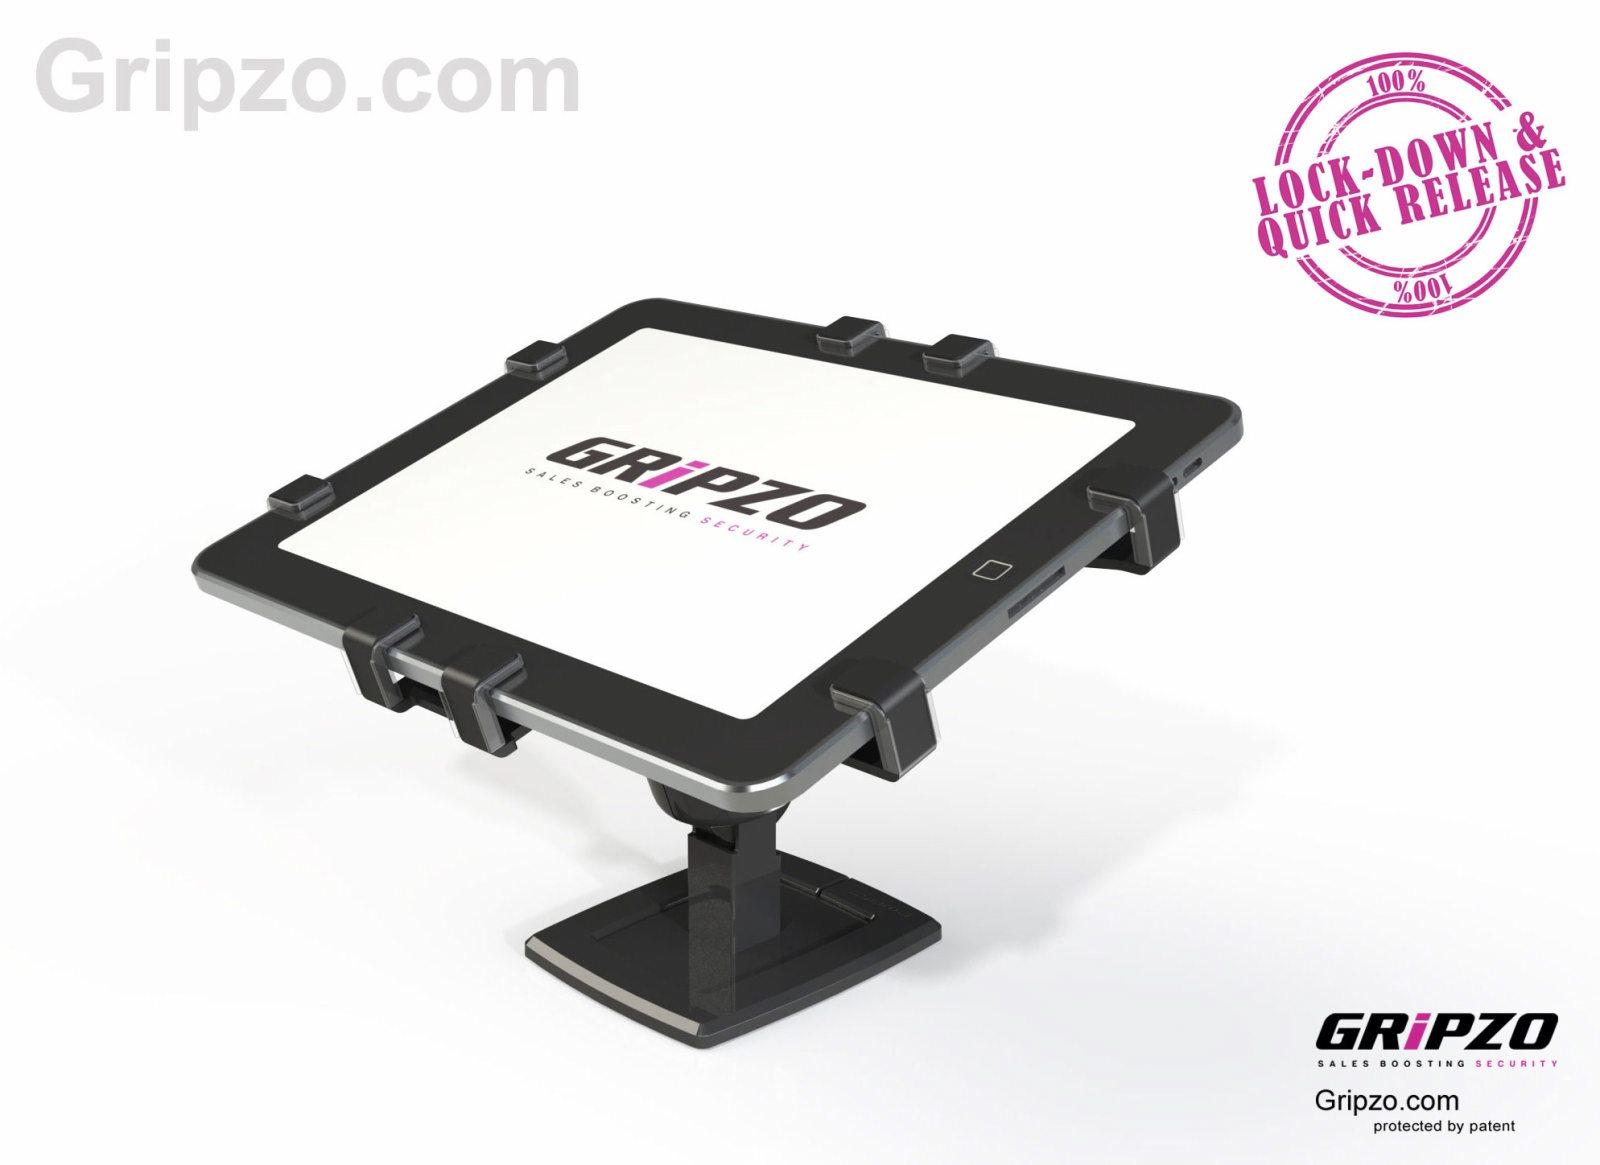 gripzo-allblack-1-met-logo.jpg